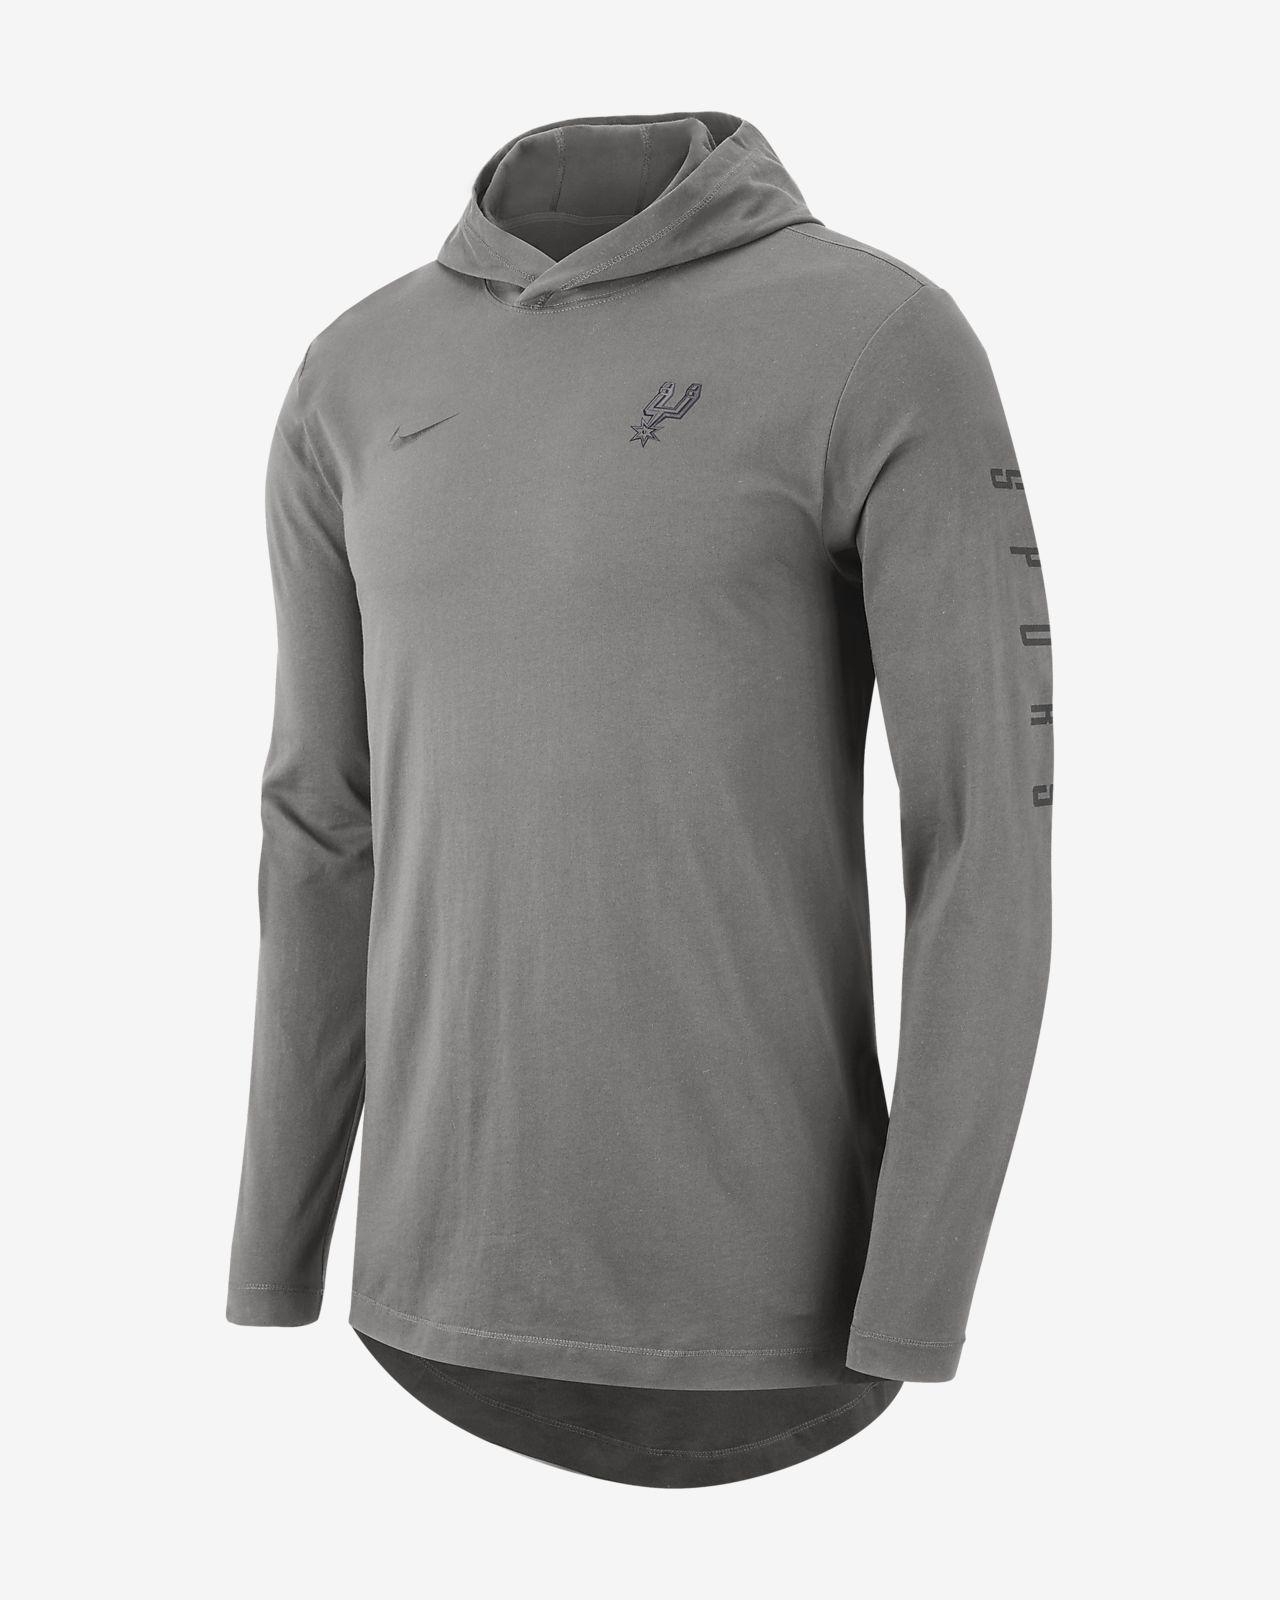 3c74c08973588f San Antonio Spurs Nike Men s Hooded Long-Sleeve NBA T-Shirt. Nike.com